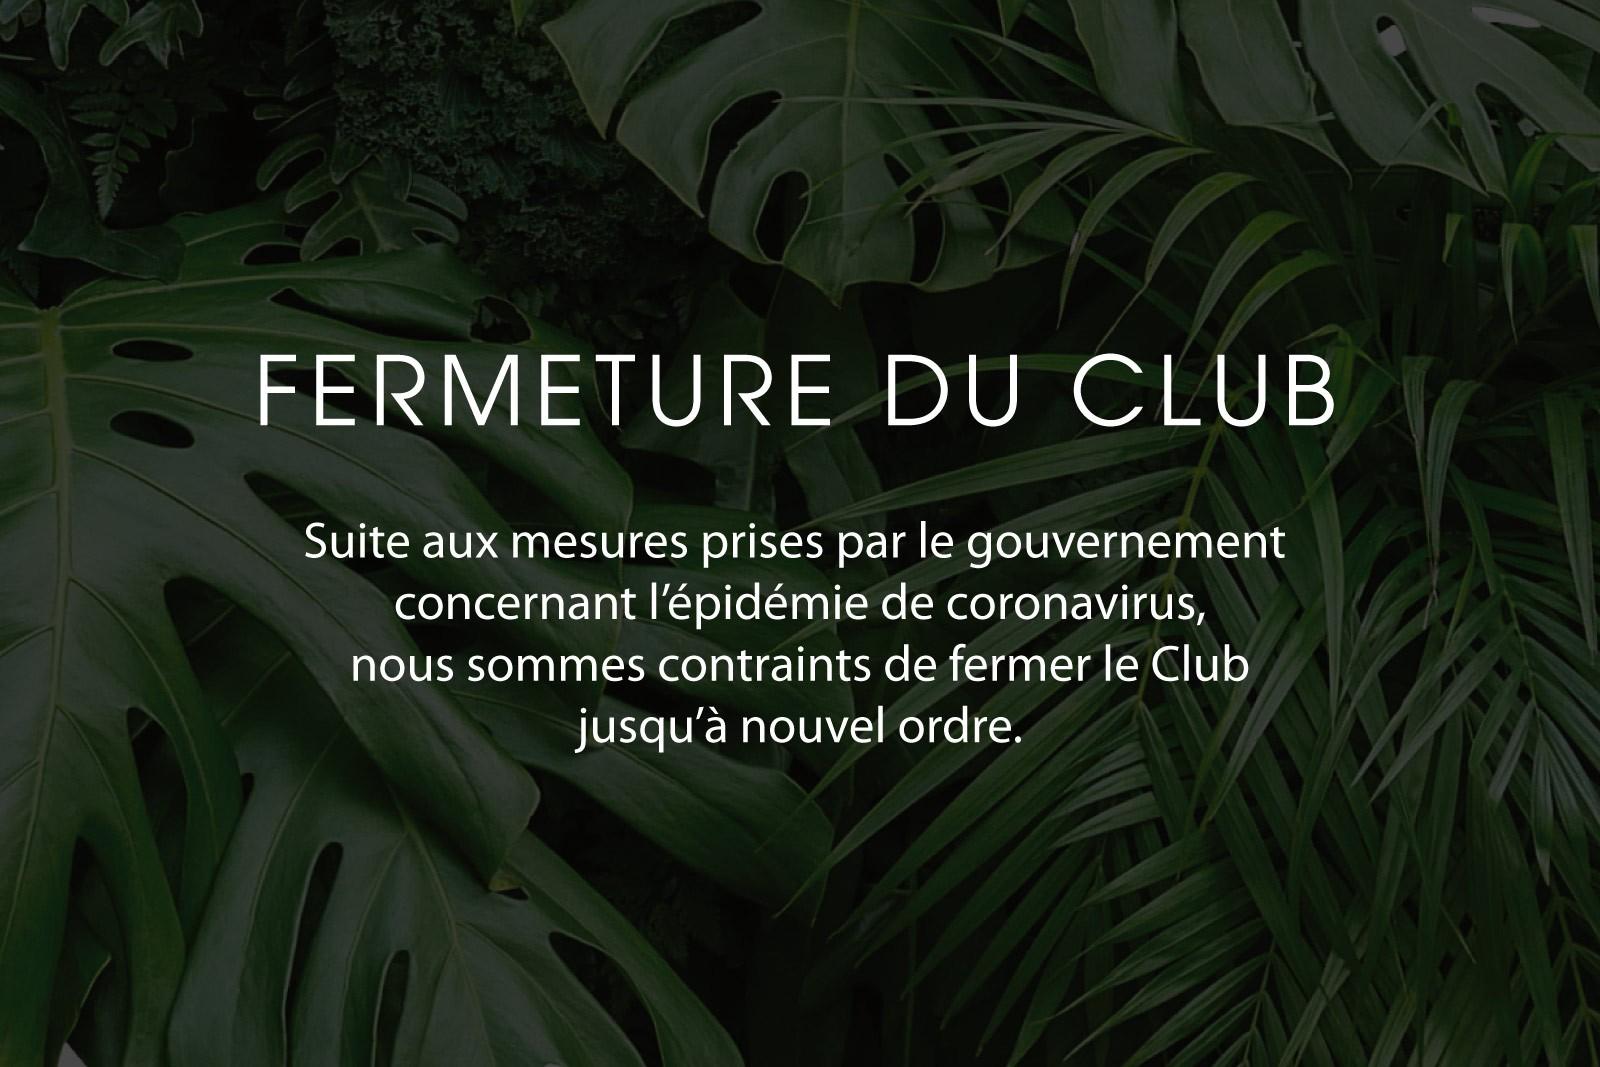 FERMETURE DU CLUB - Covid-19